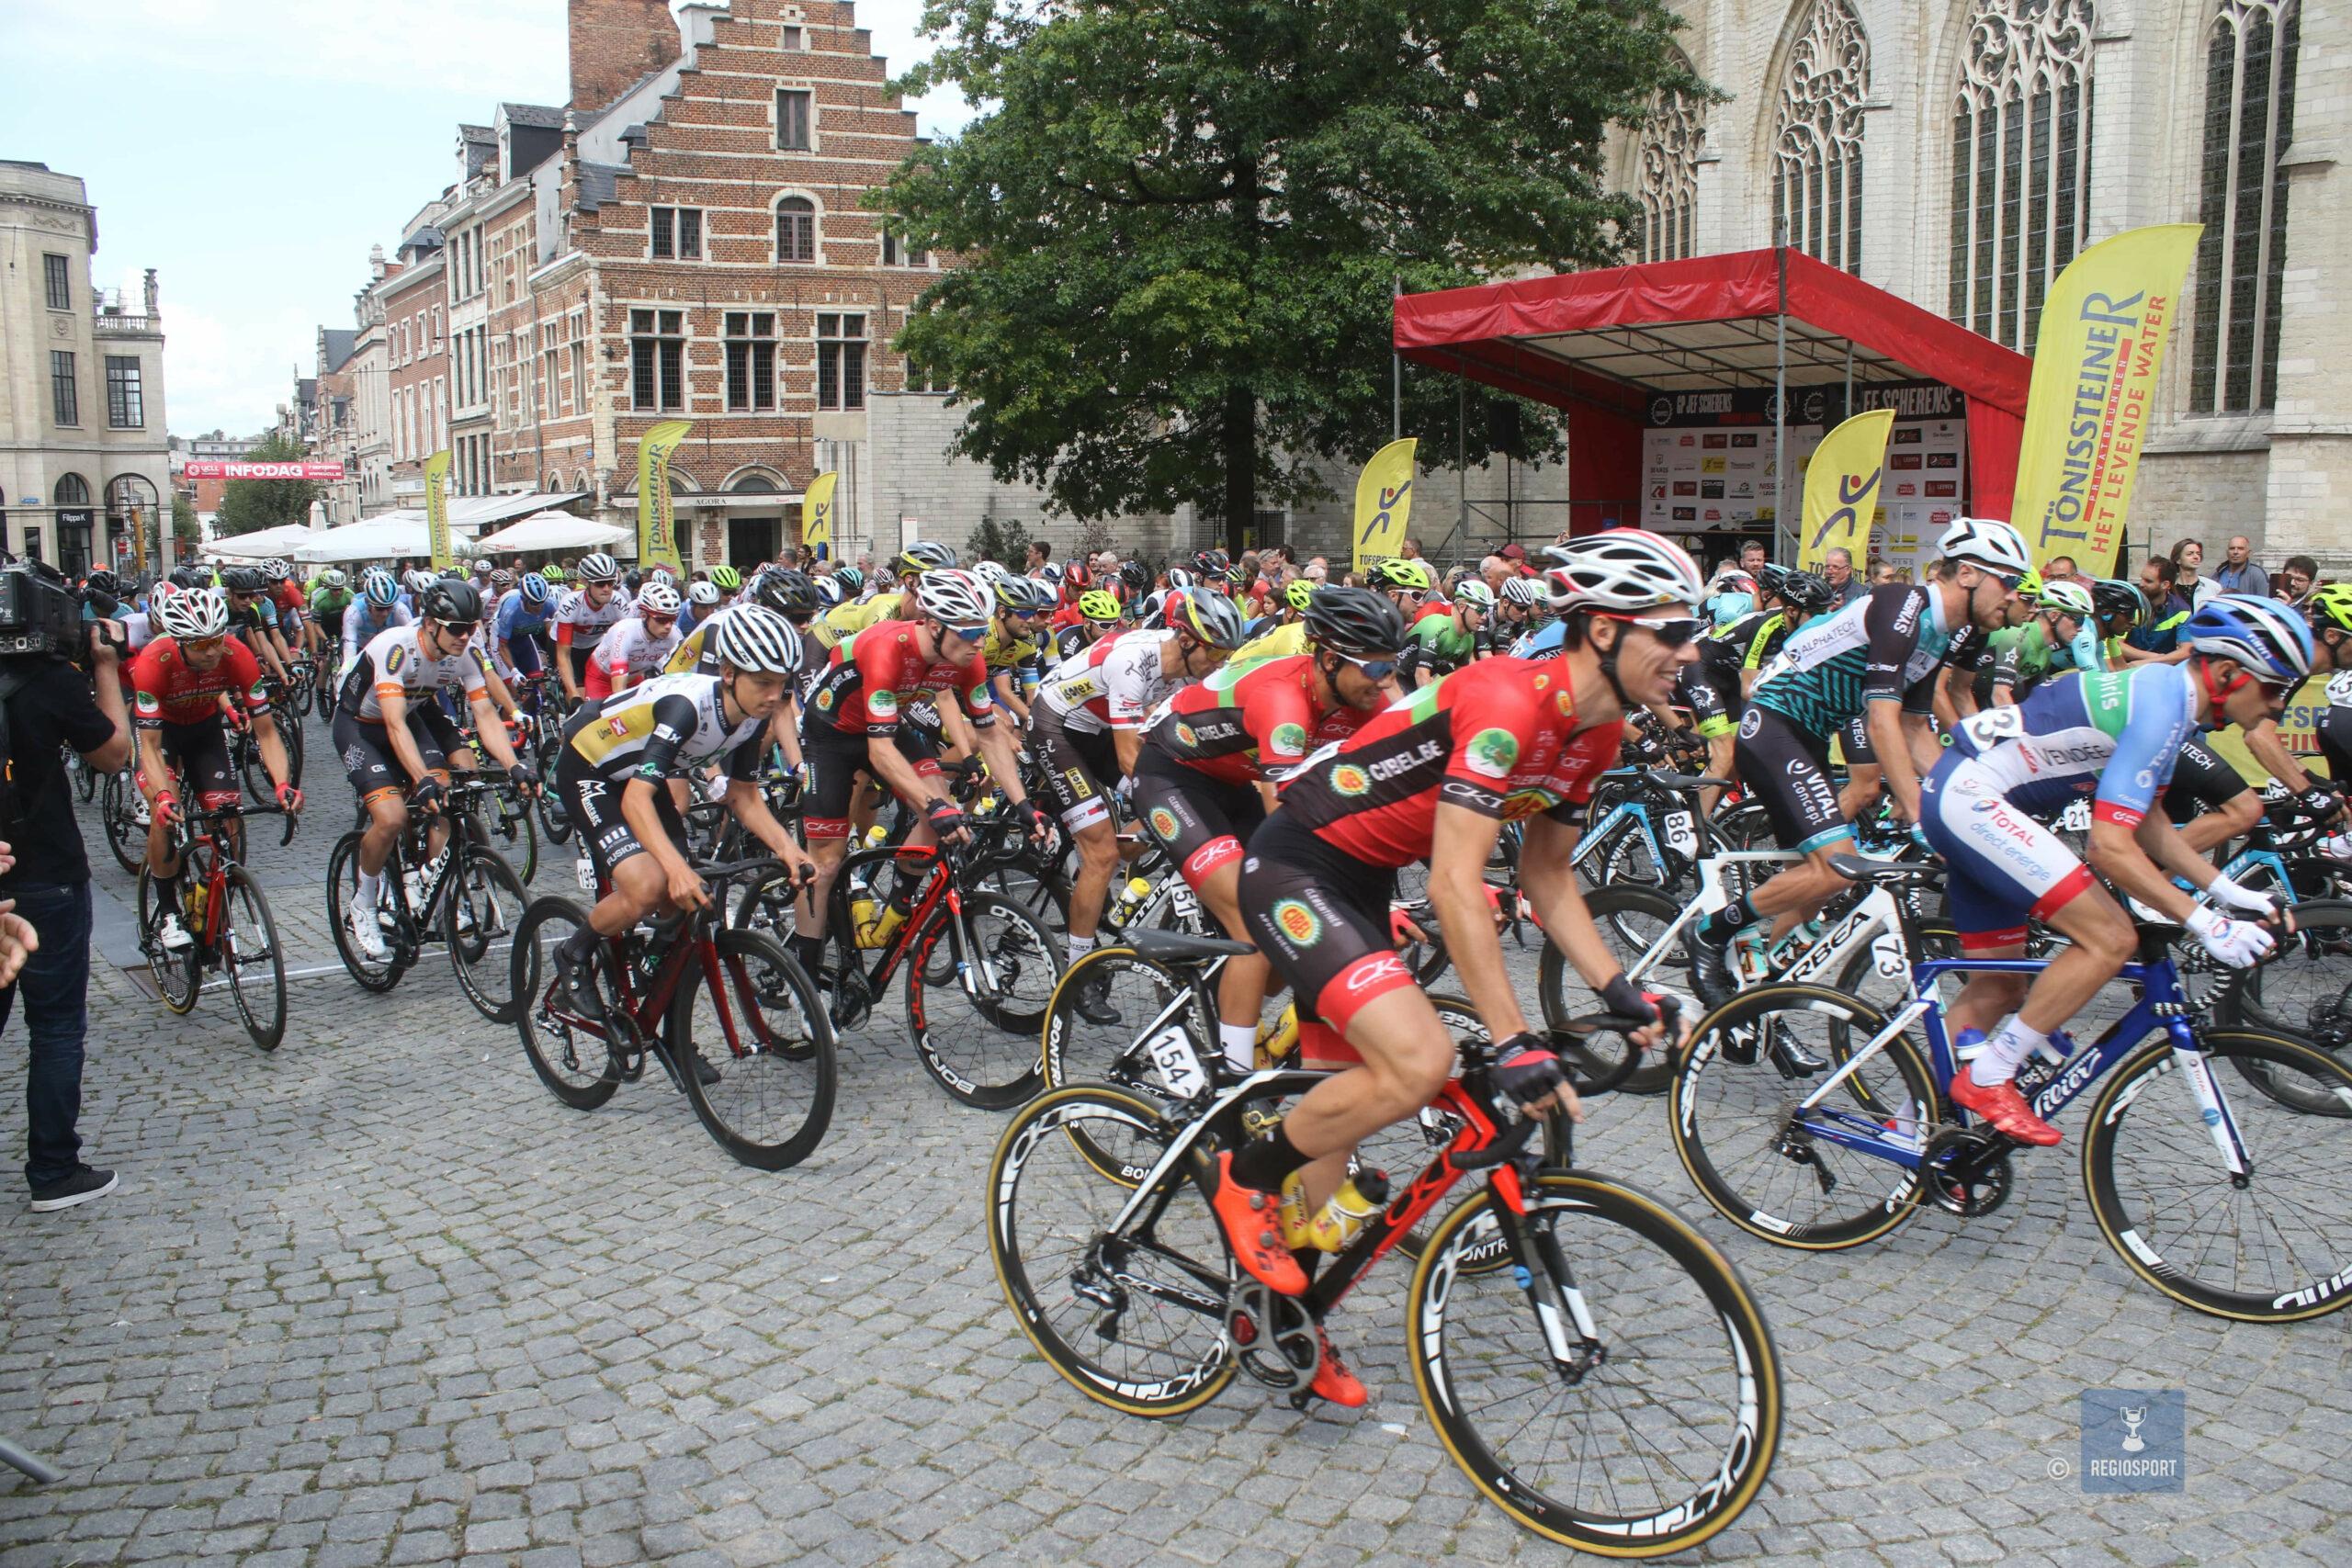 54ste GP Jef Scherens – Rondom Leuven barst los op 29 augustus 2021